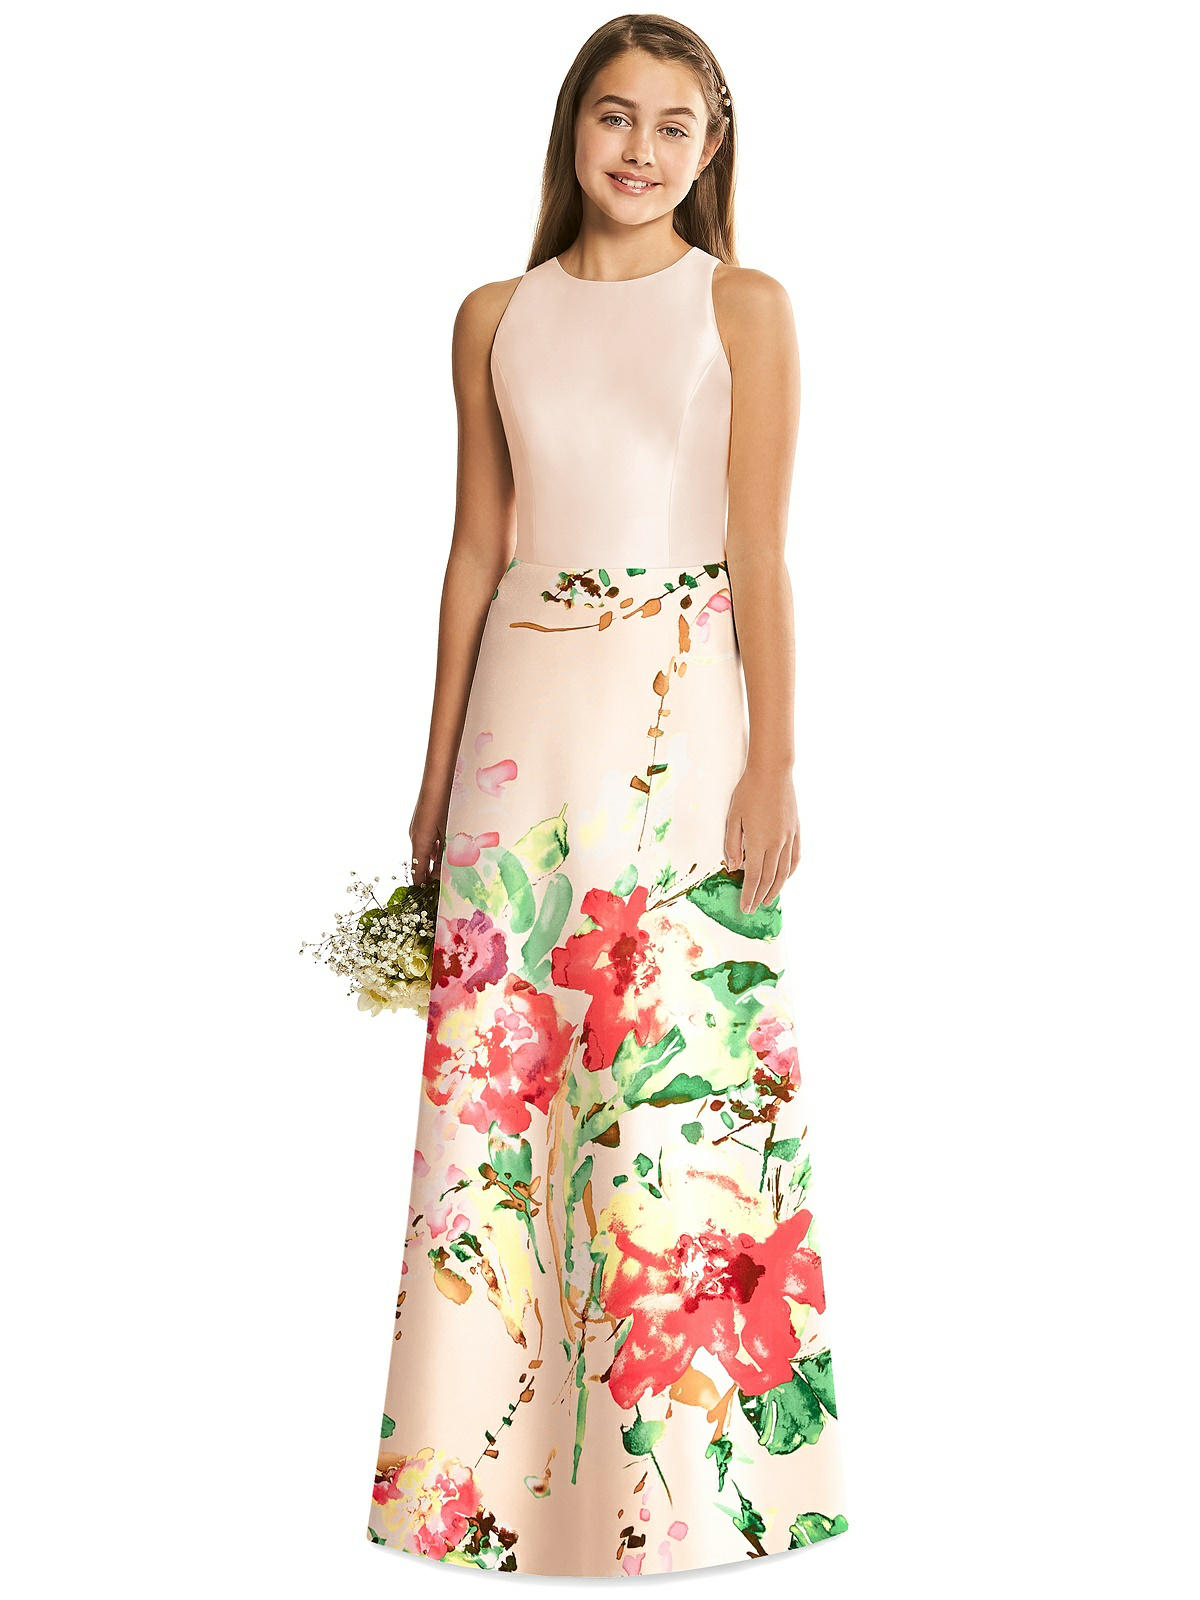 eea73c591 Home · Bridesmaid Dresses · Alfred Sung Junior Bridesmaid Dress JR545CBP.  ○; ○